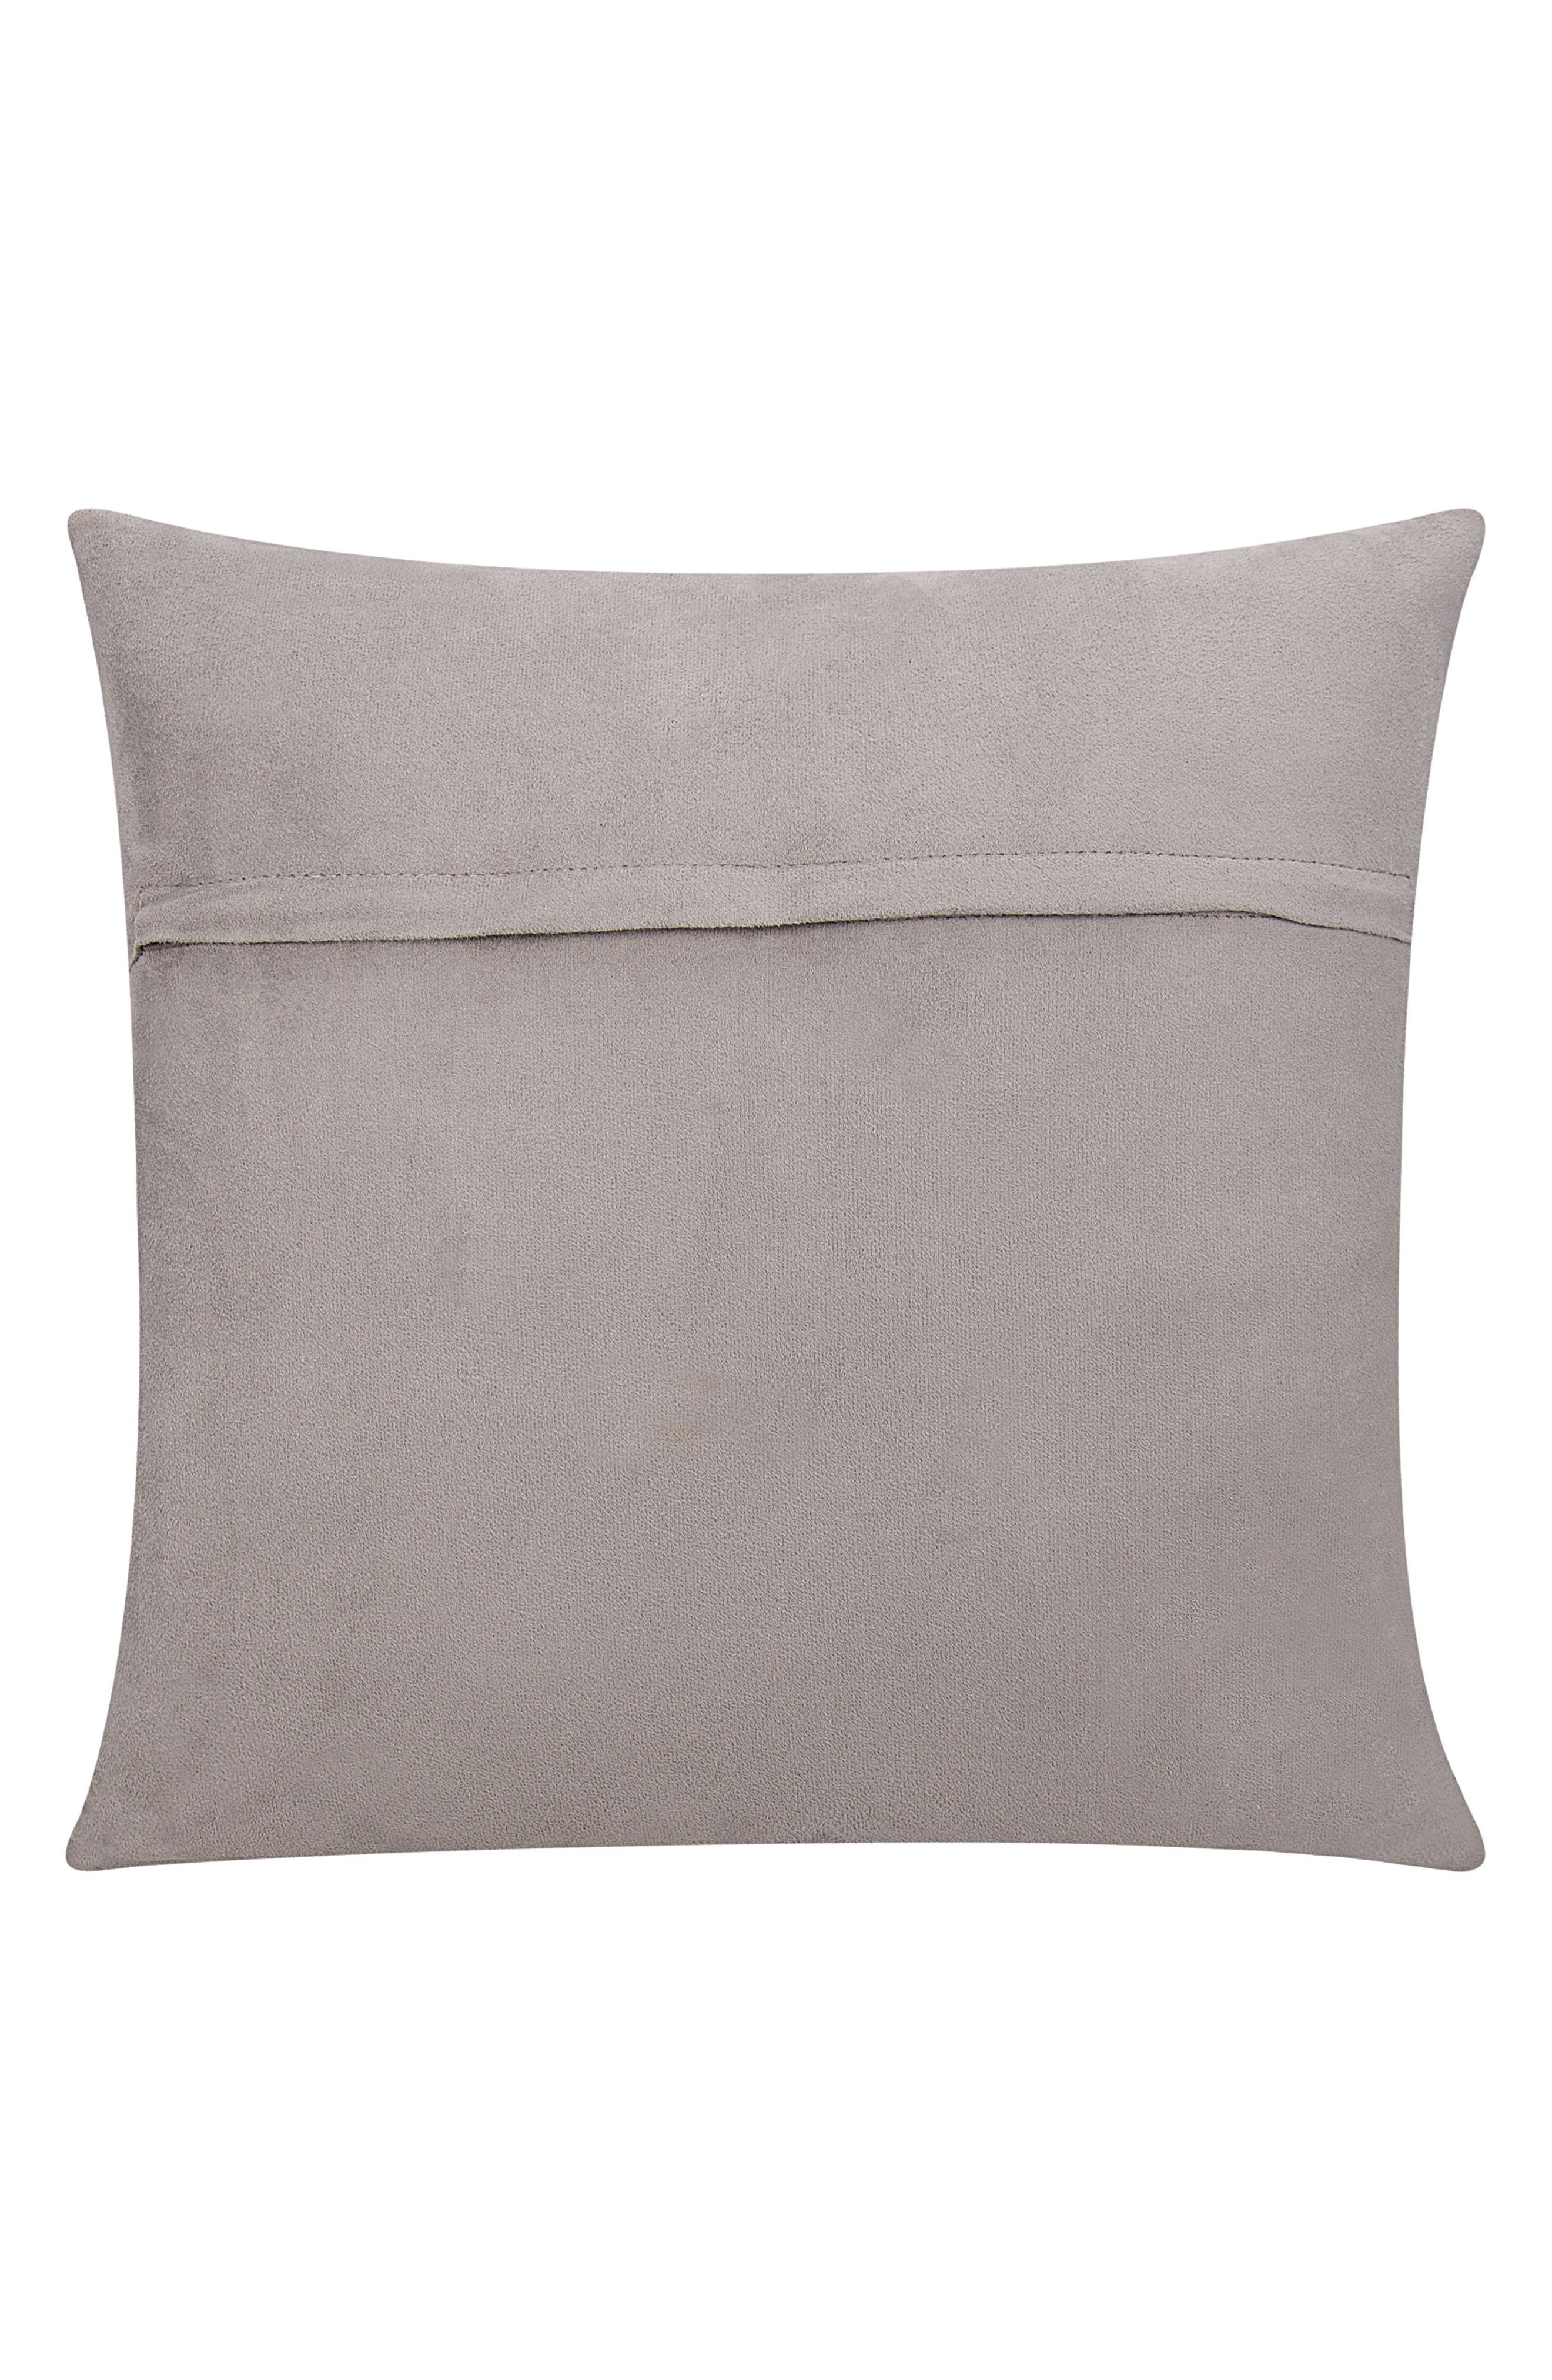 MINA VICTORY,                             Calf Hair Accent Pillow,                             Alternate thumbnail 2, color,                             062